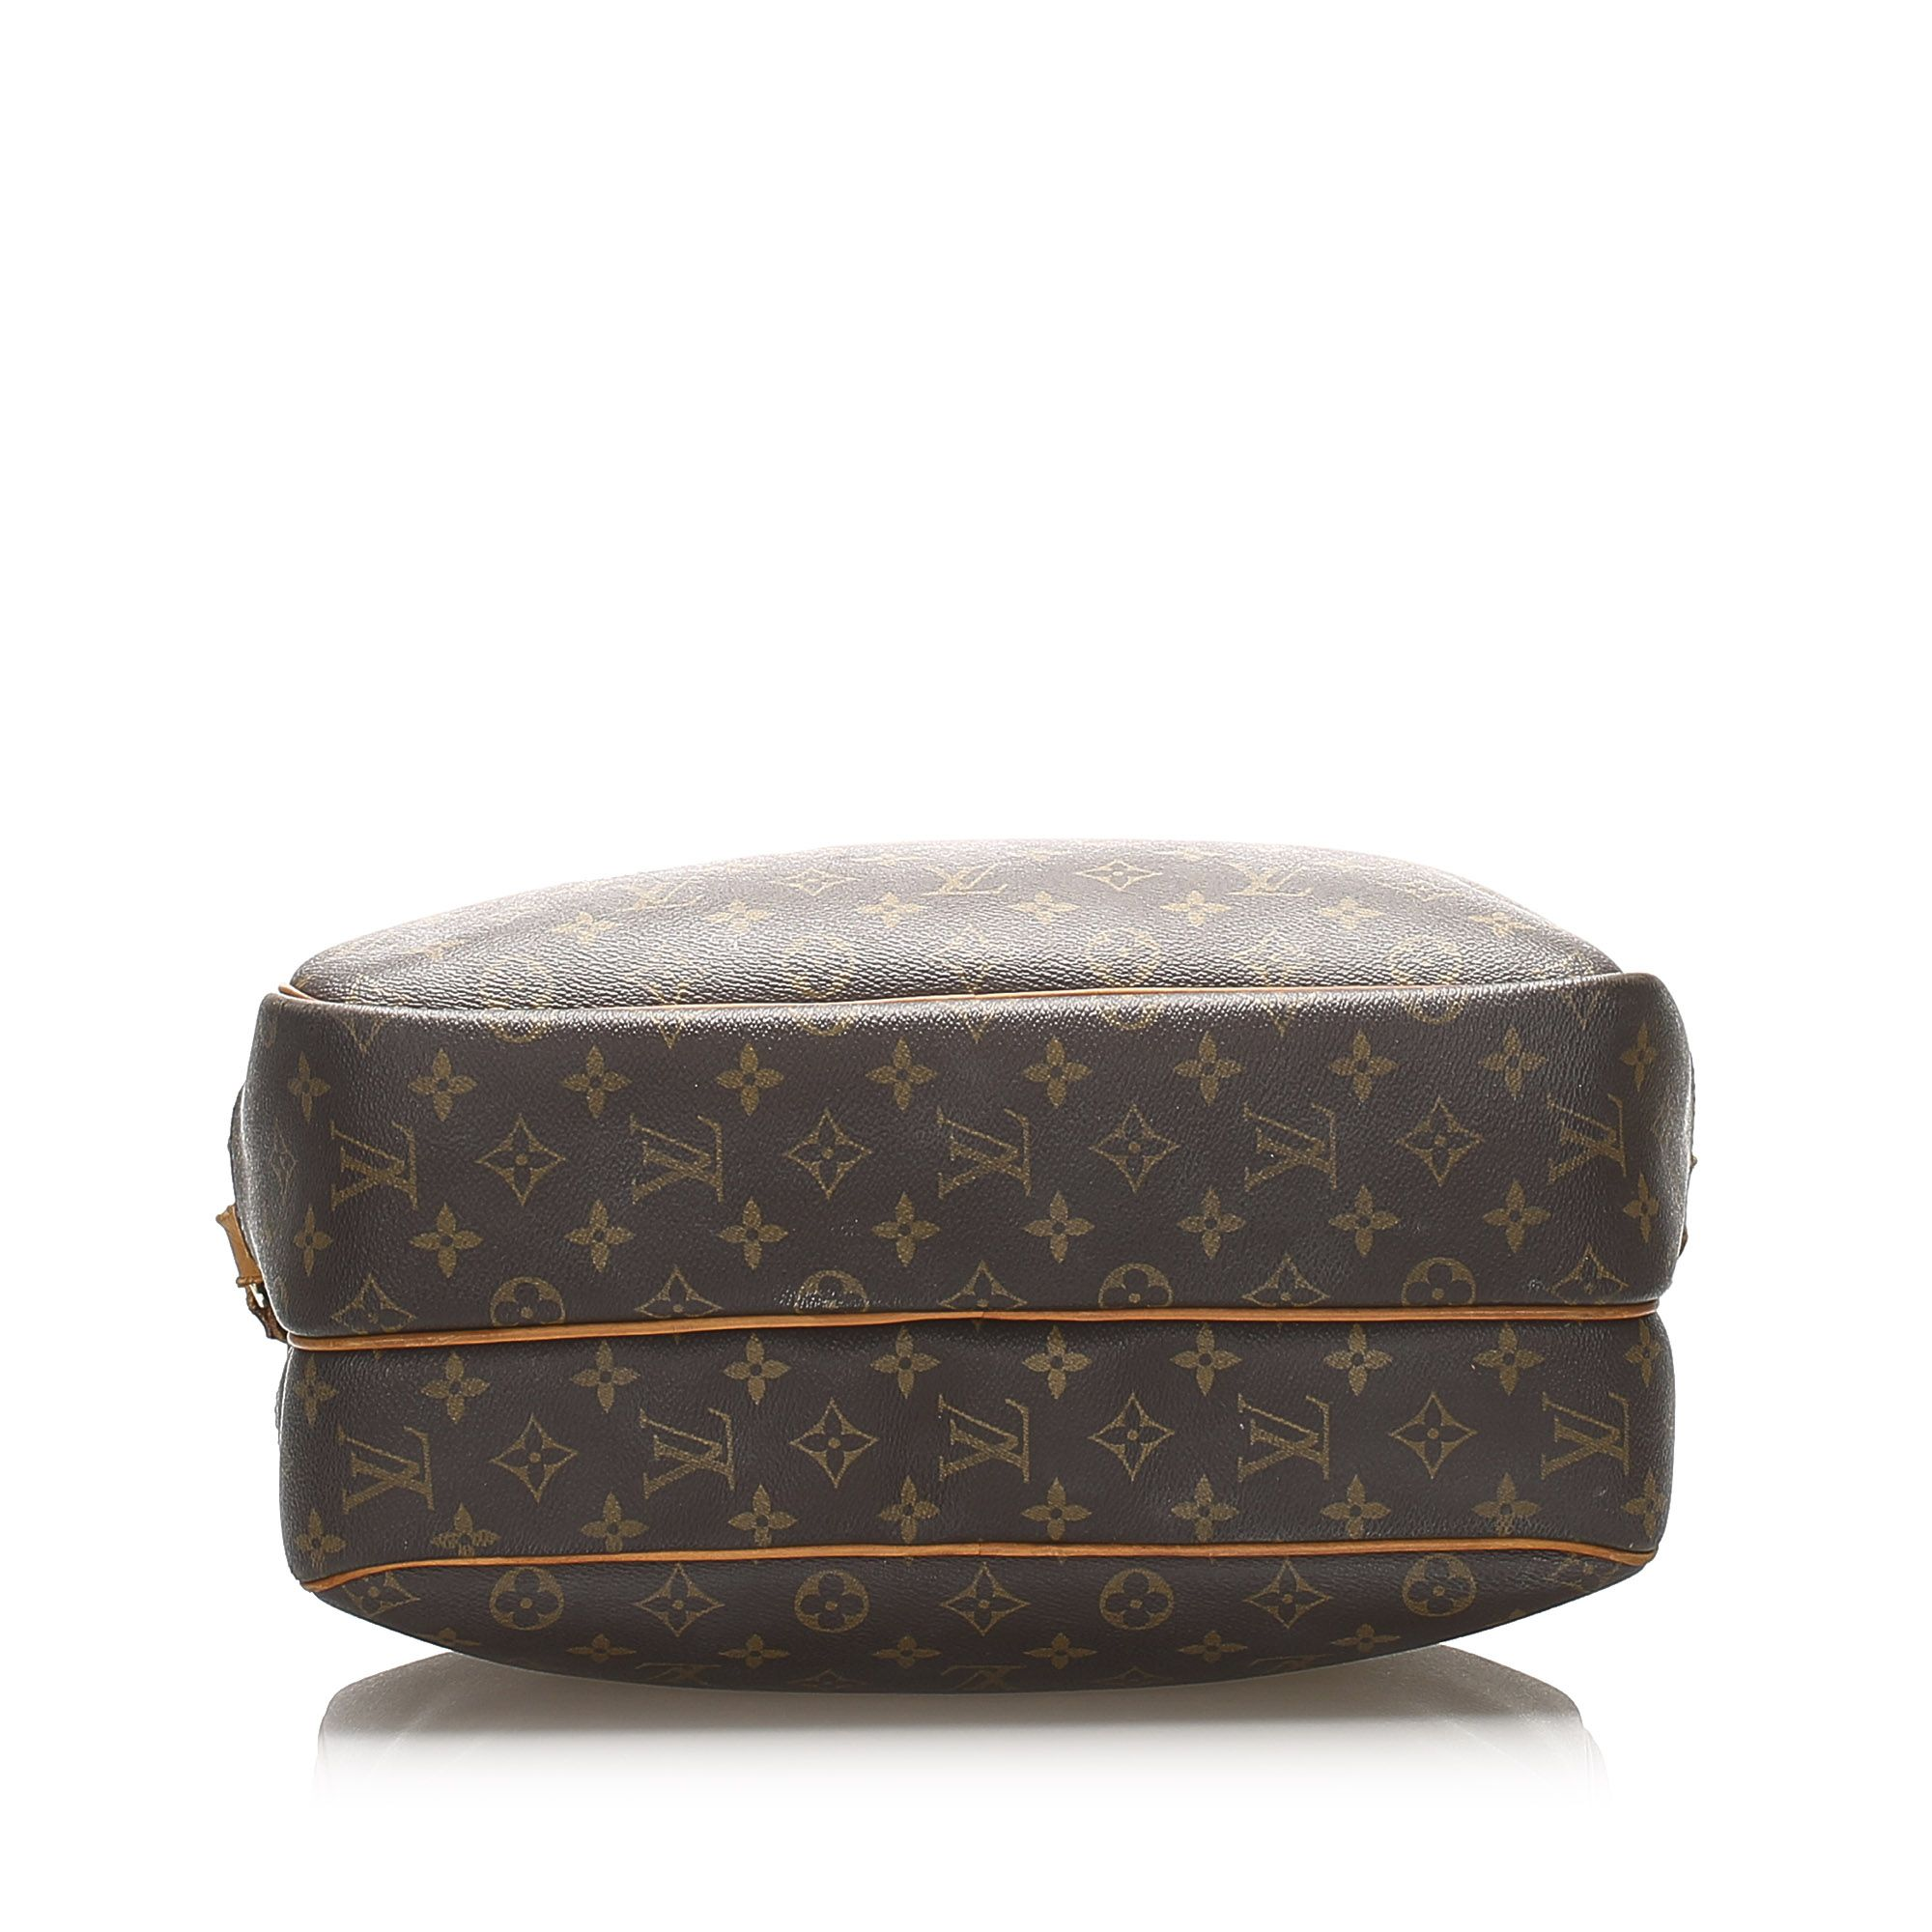 Vintage Louis Vuitton Monogram Reporter GM Brown